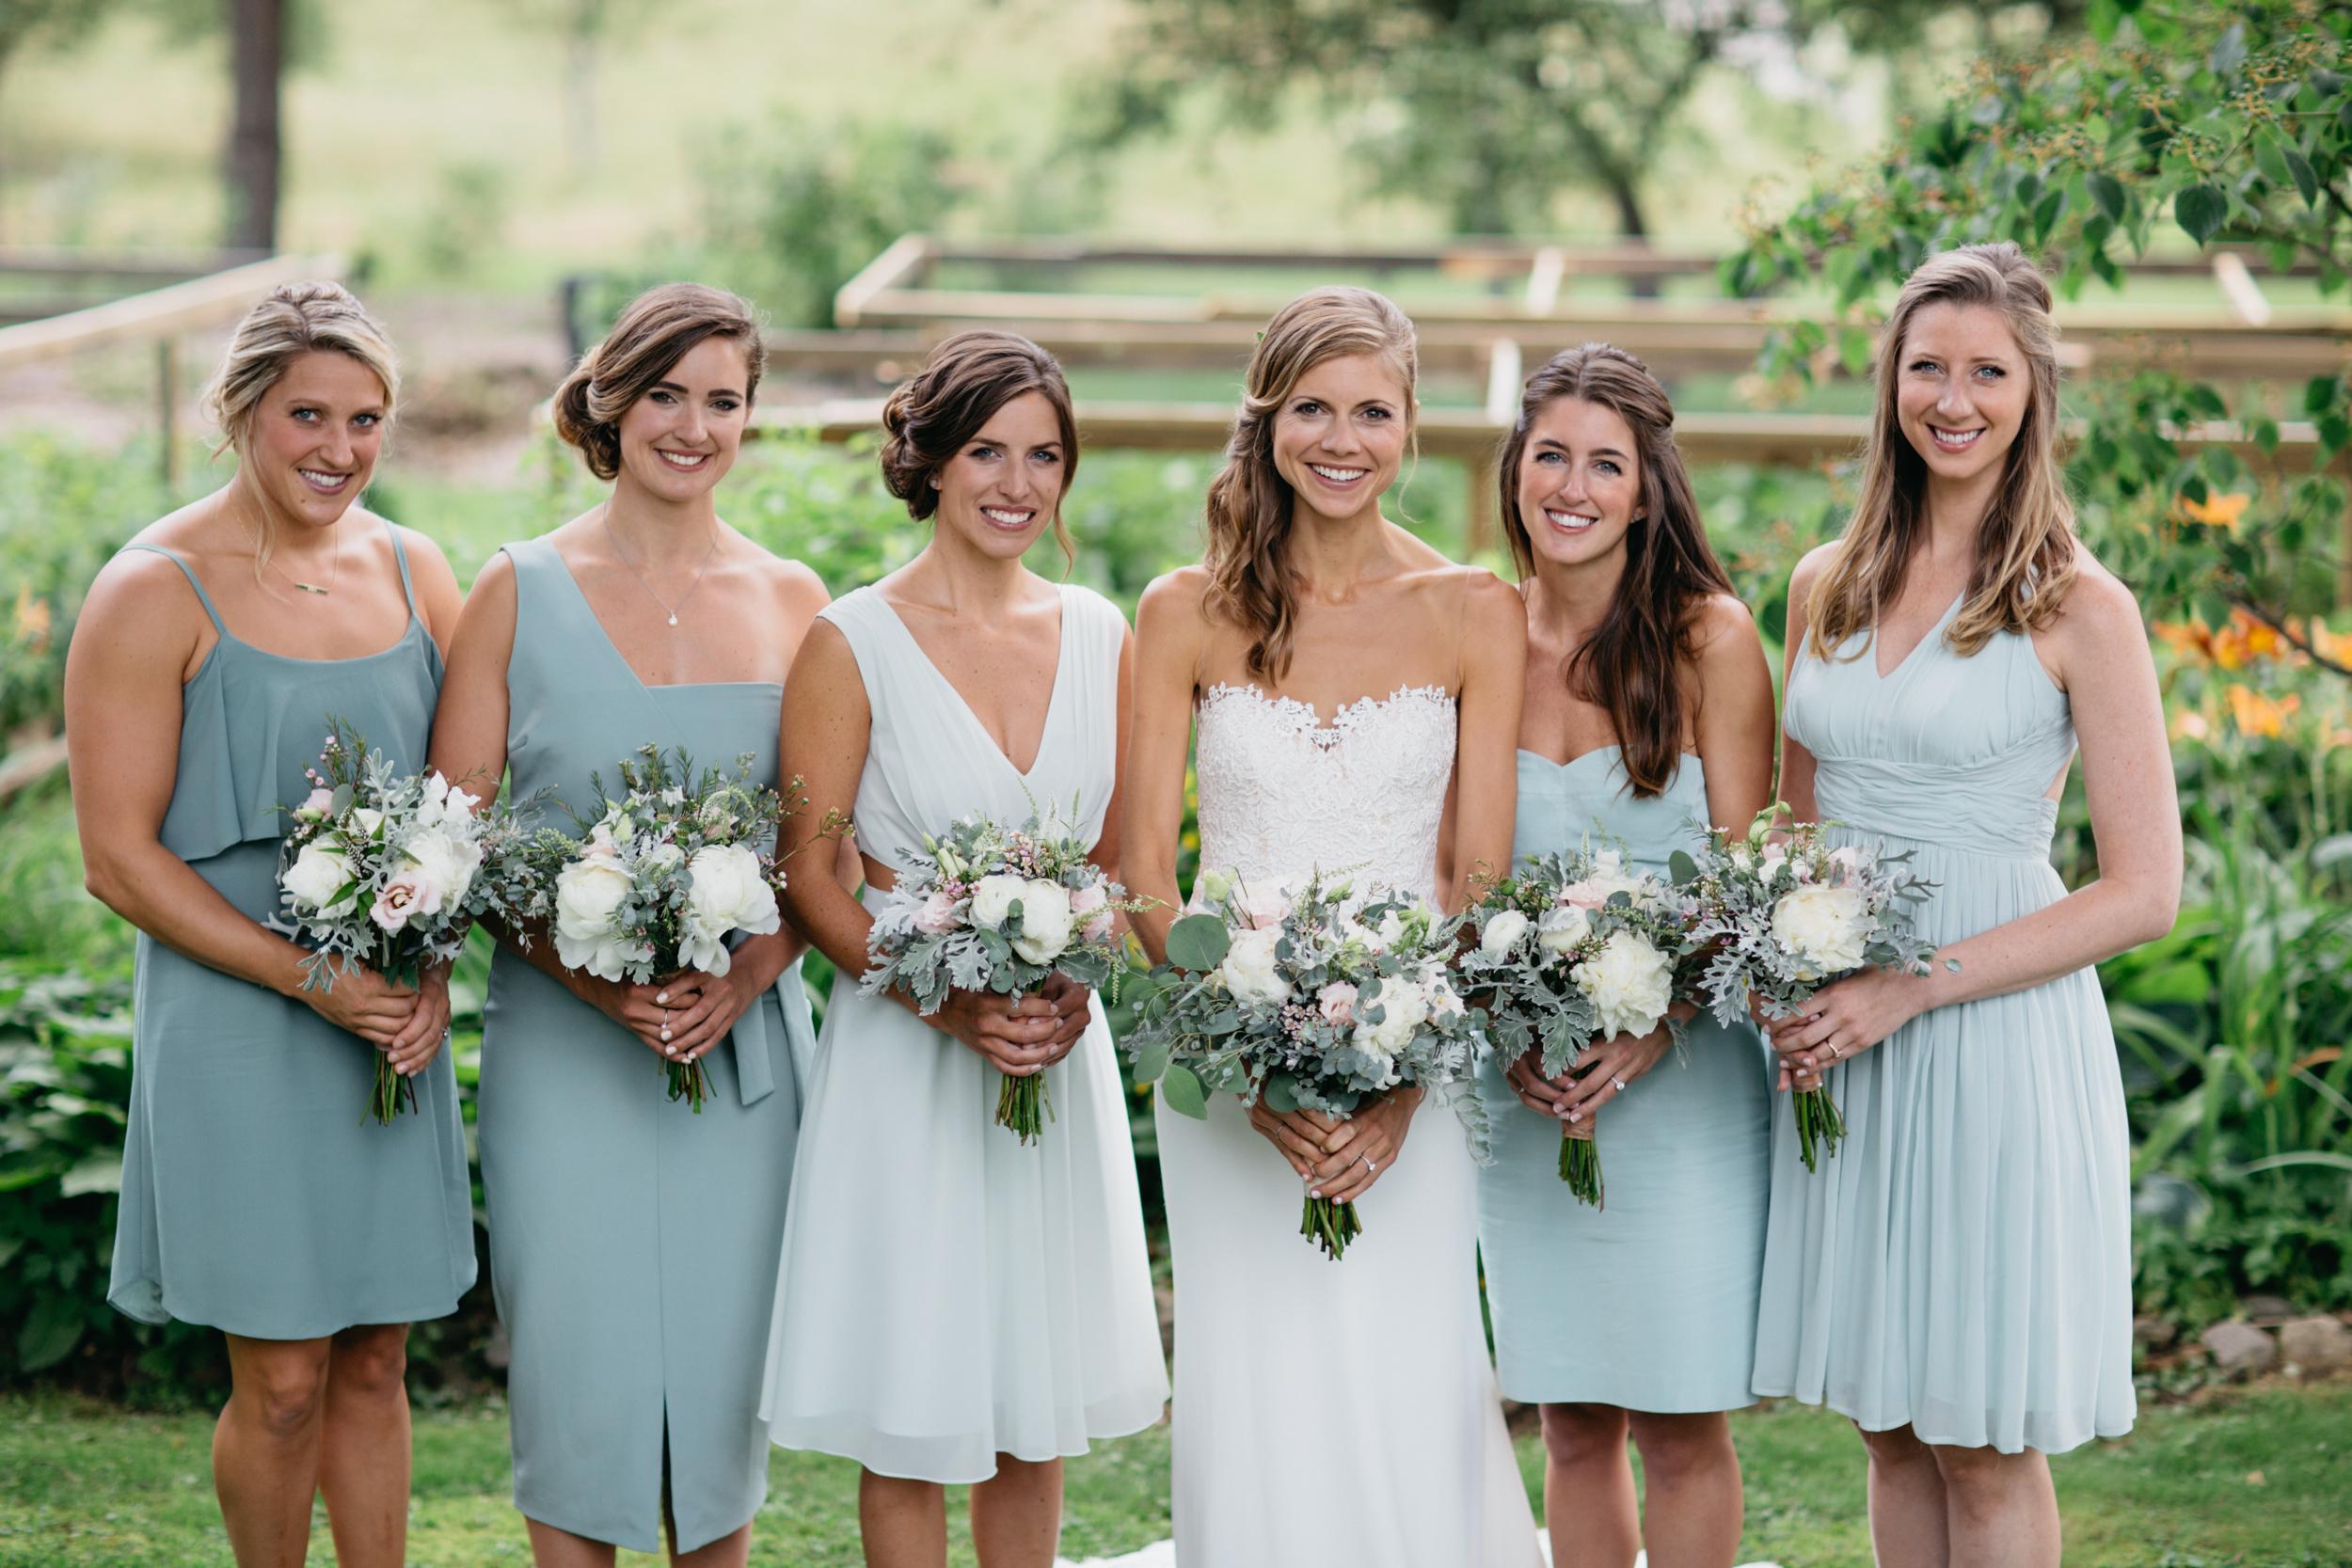 Karen_Alex_Bliss_ridge_farm_Vermont_wedding009.jpg